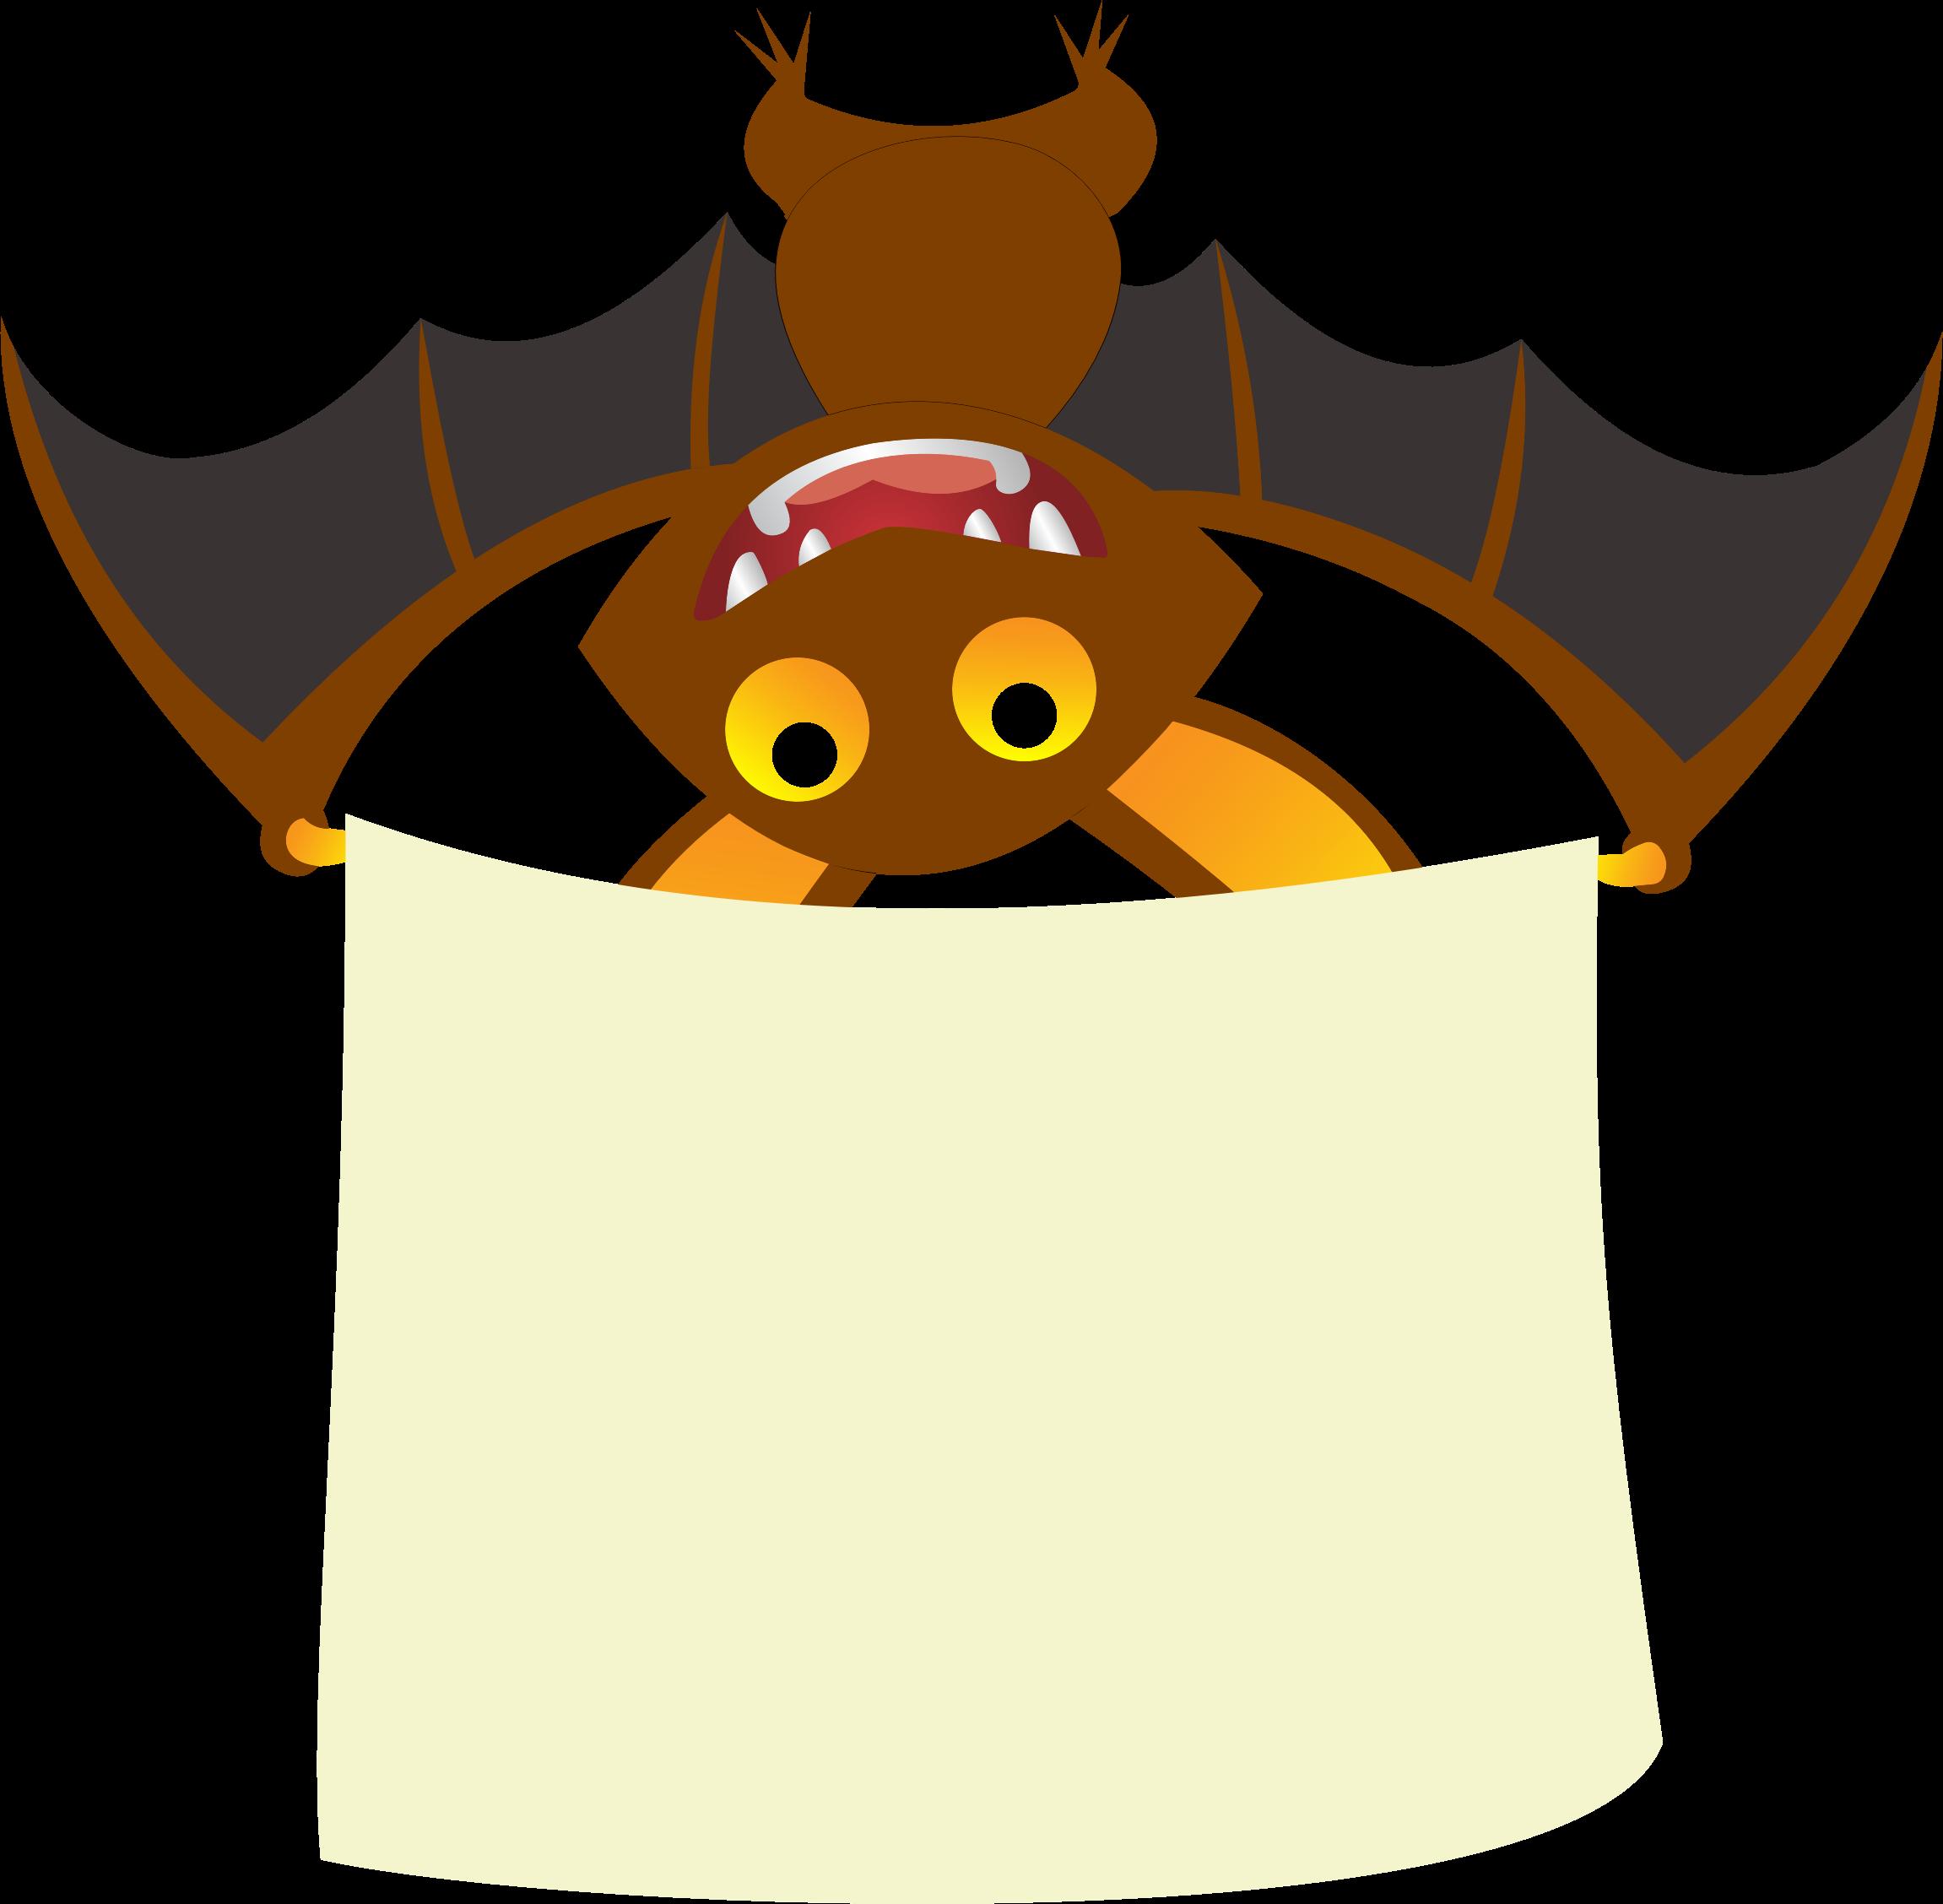 Bat Banner Vector Clipart image.